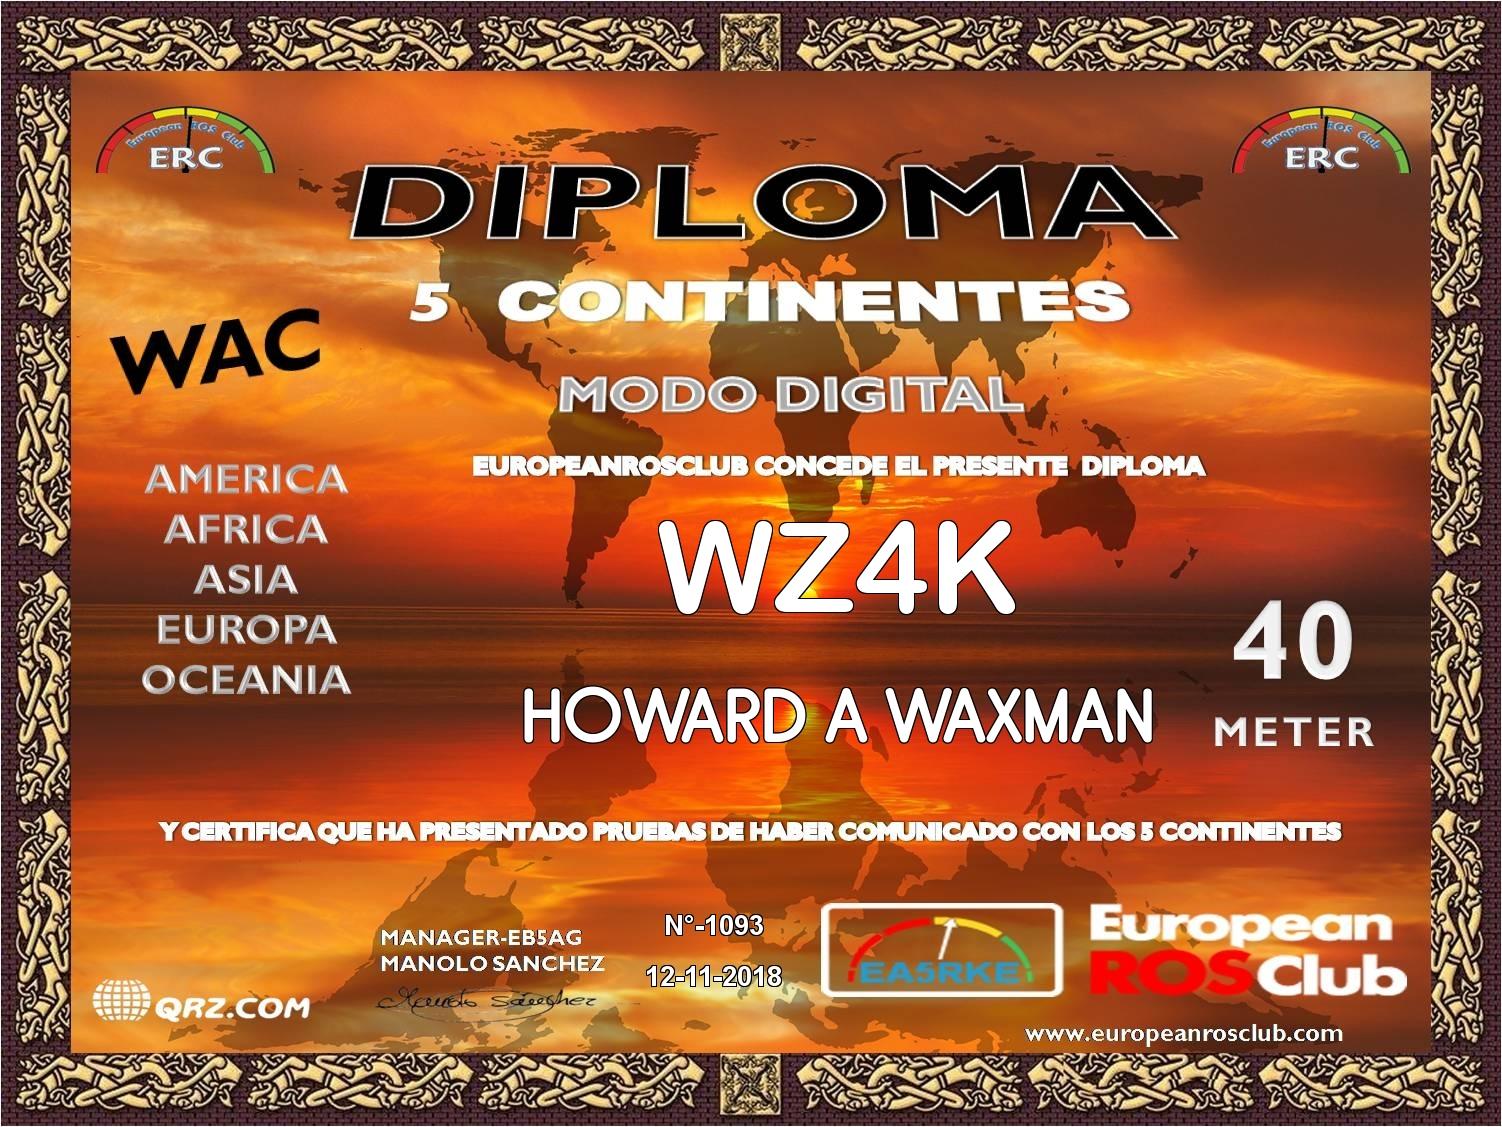 WZ4K-DCM-40M